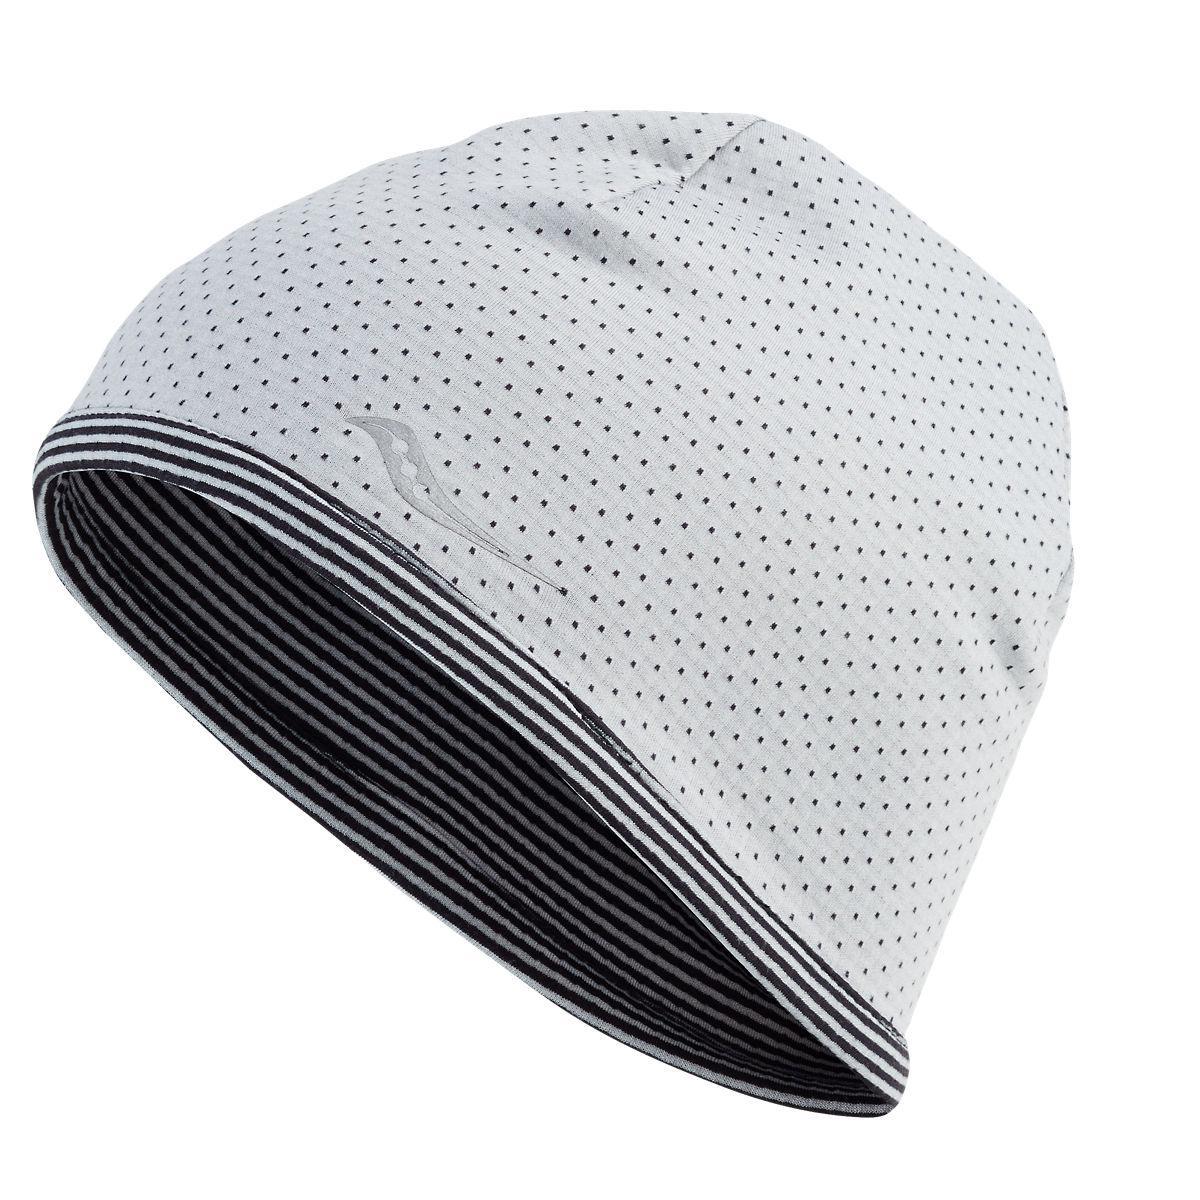 34a82341 Saucony Swift Skull Cap in Black for Men - Lyst